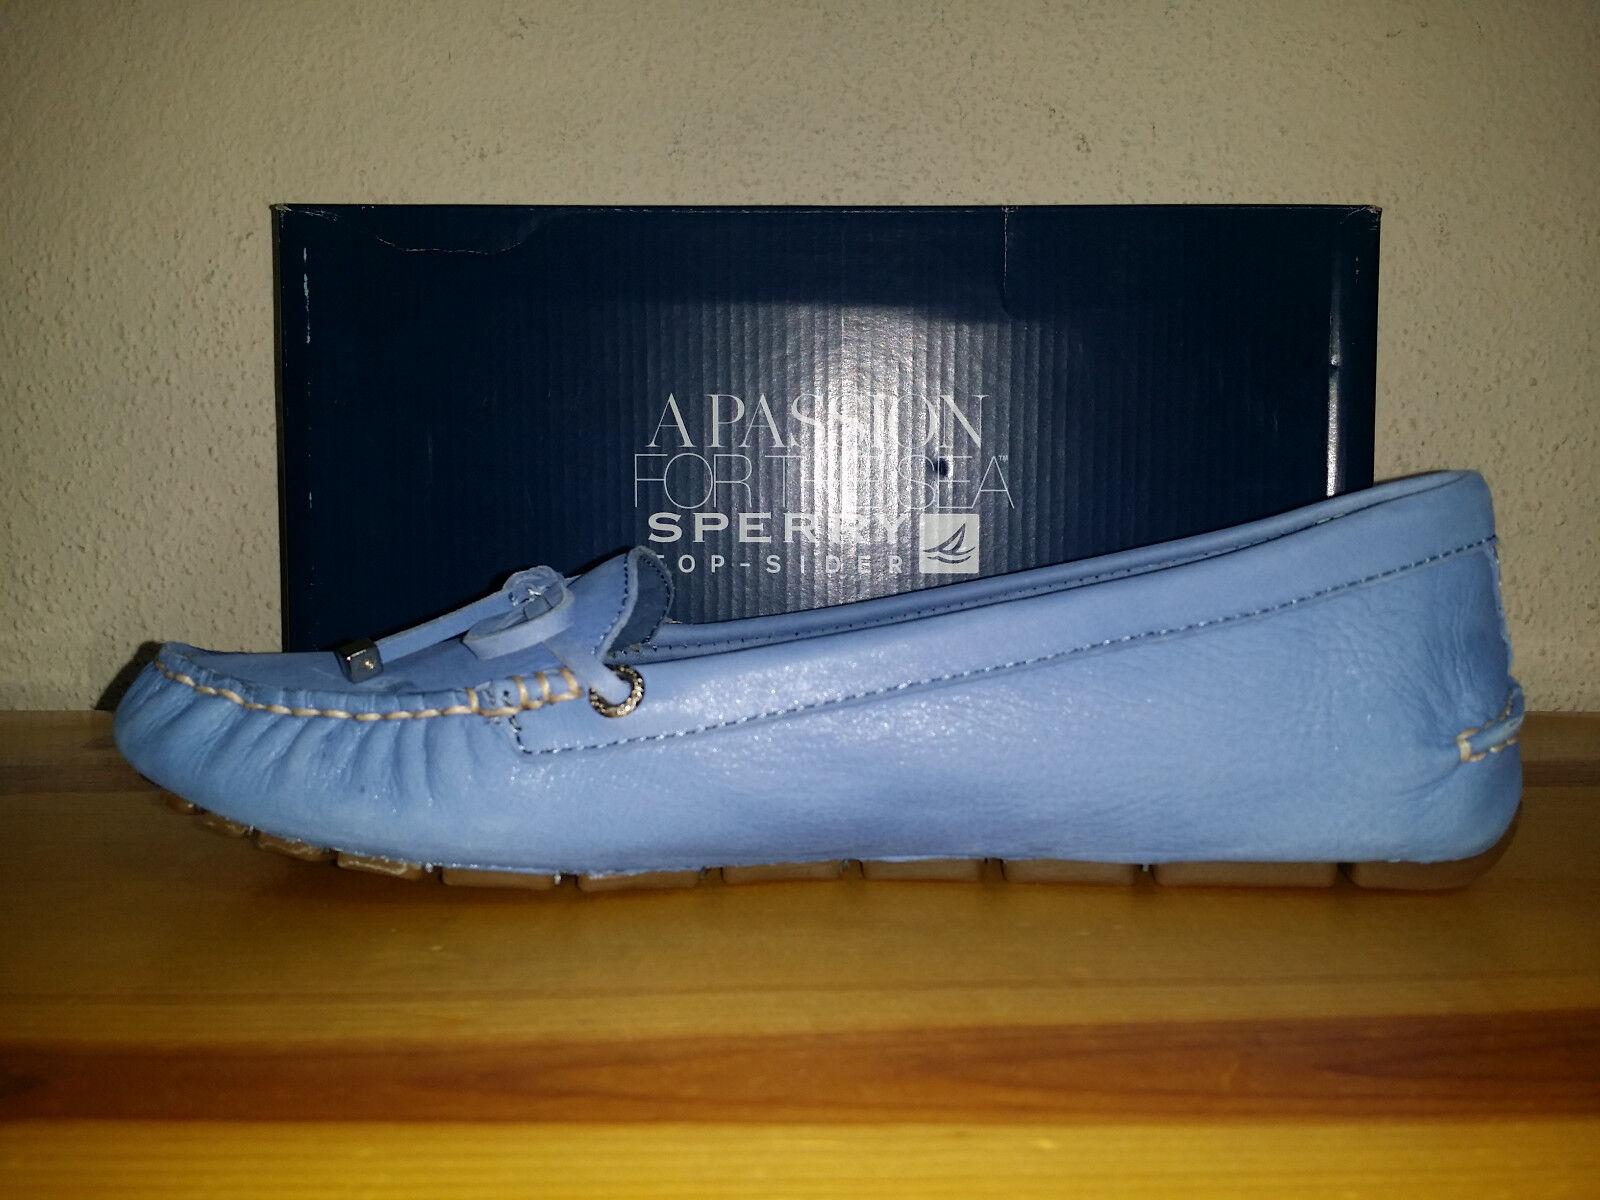 Sperry 90 para mujer 9.5 Sperry  Top-Sider Katharine Brillos Zapatos Náuticos Azul 850d6e